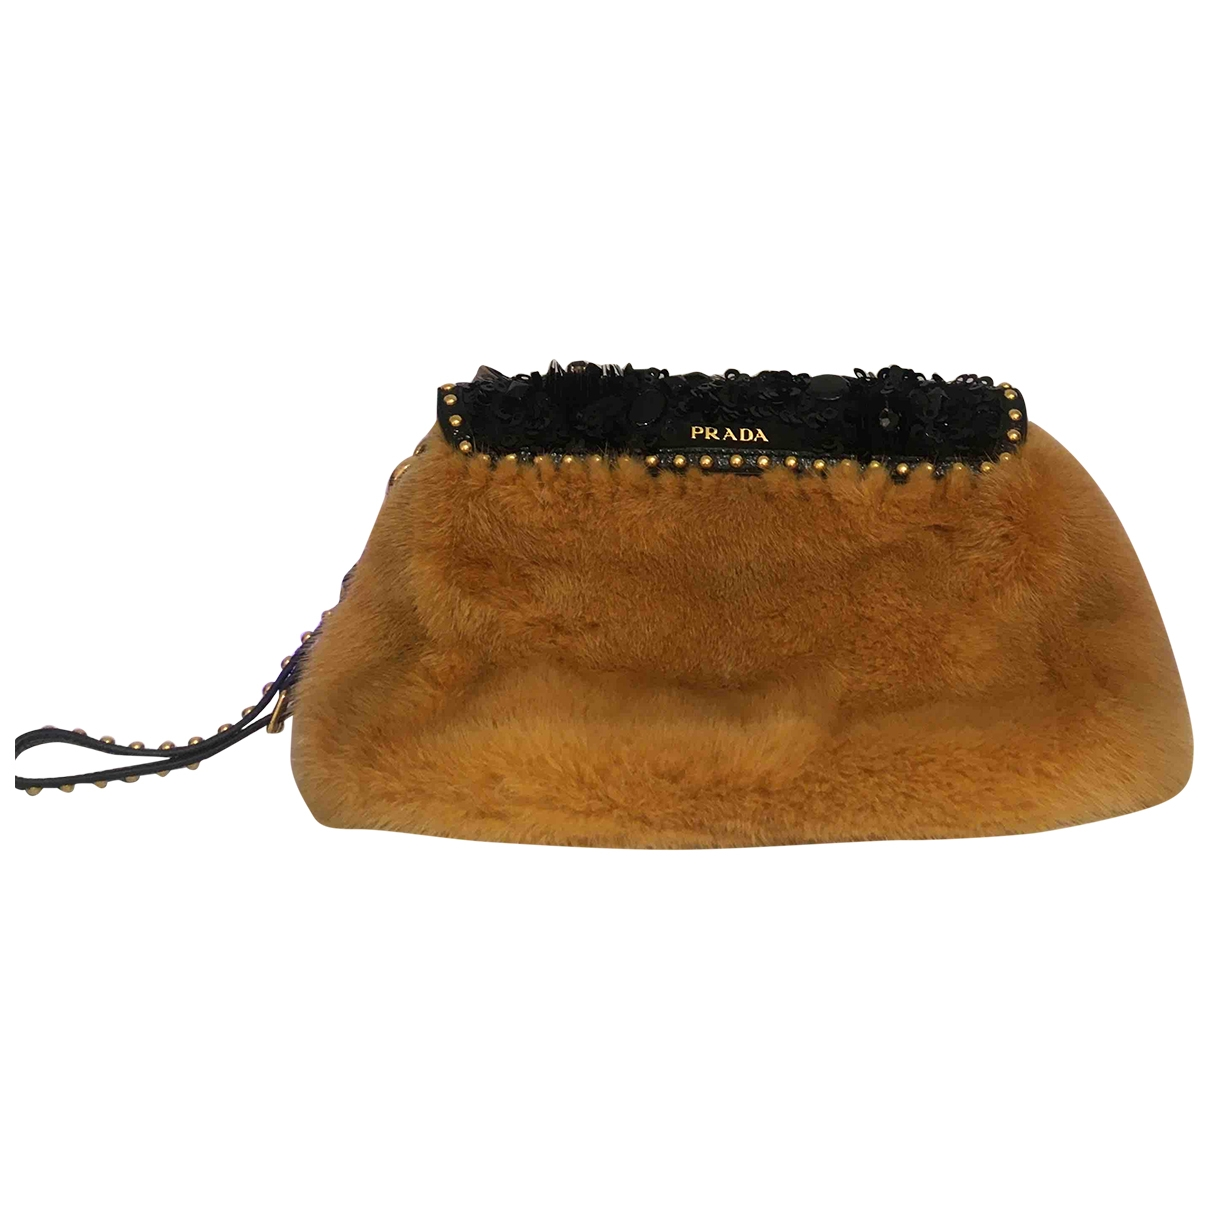 Prada \N Yellow Mink Clutch bag for Women \N